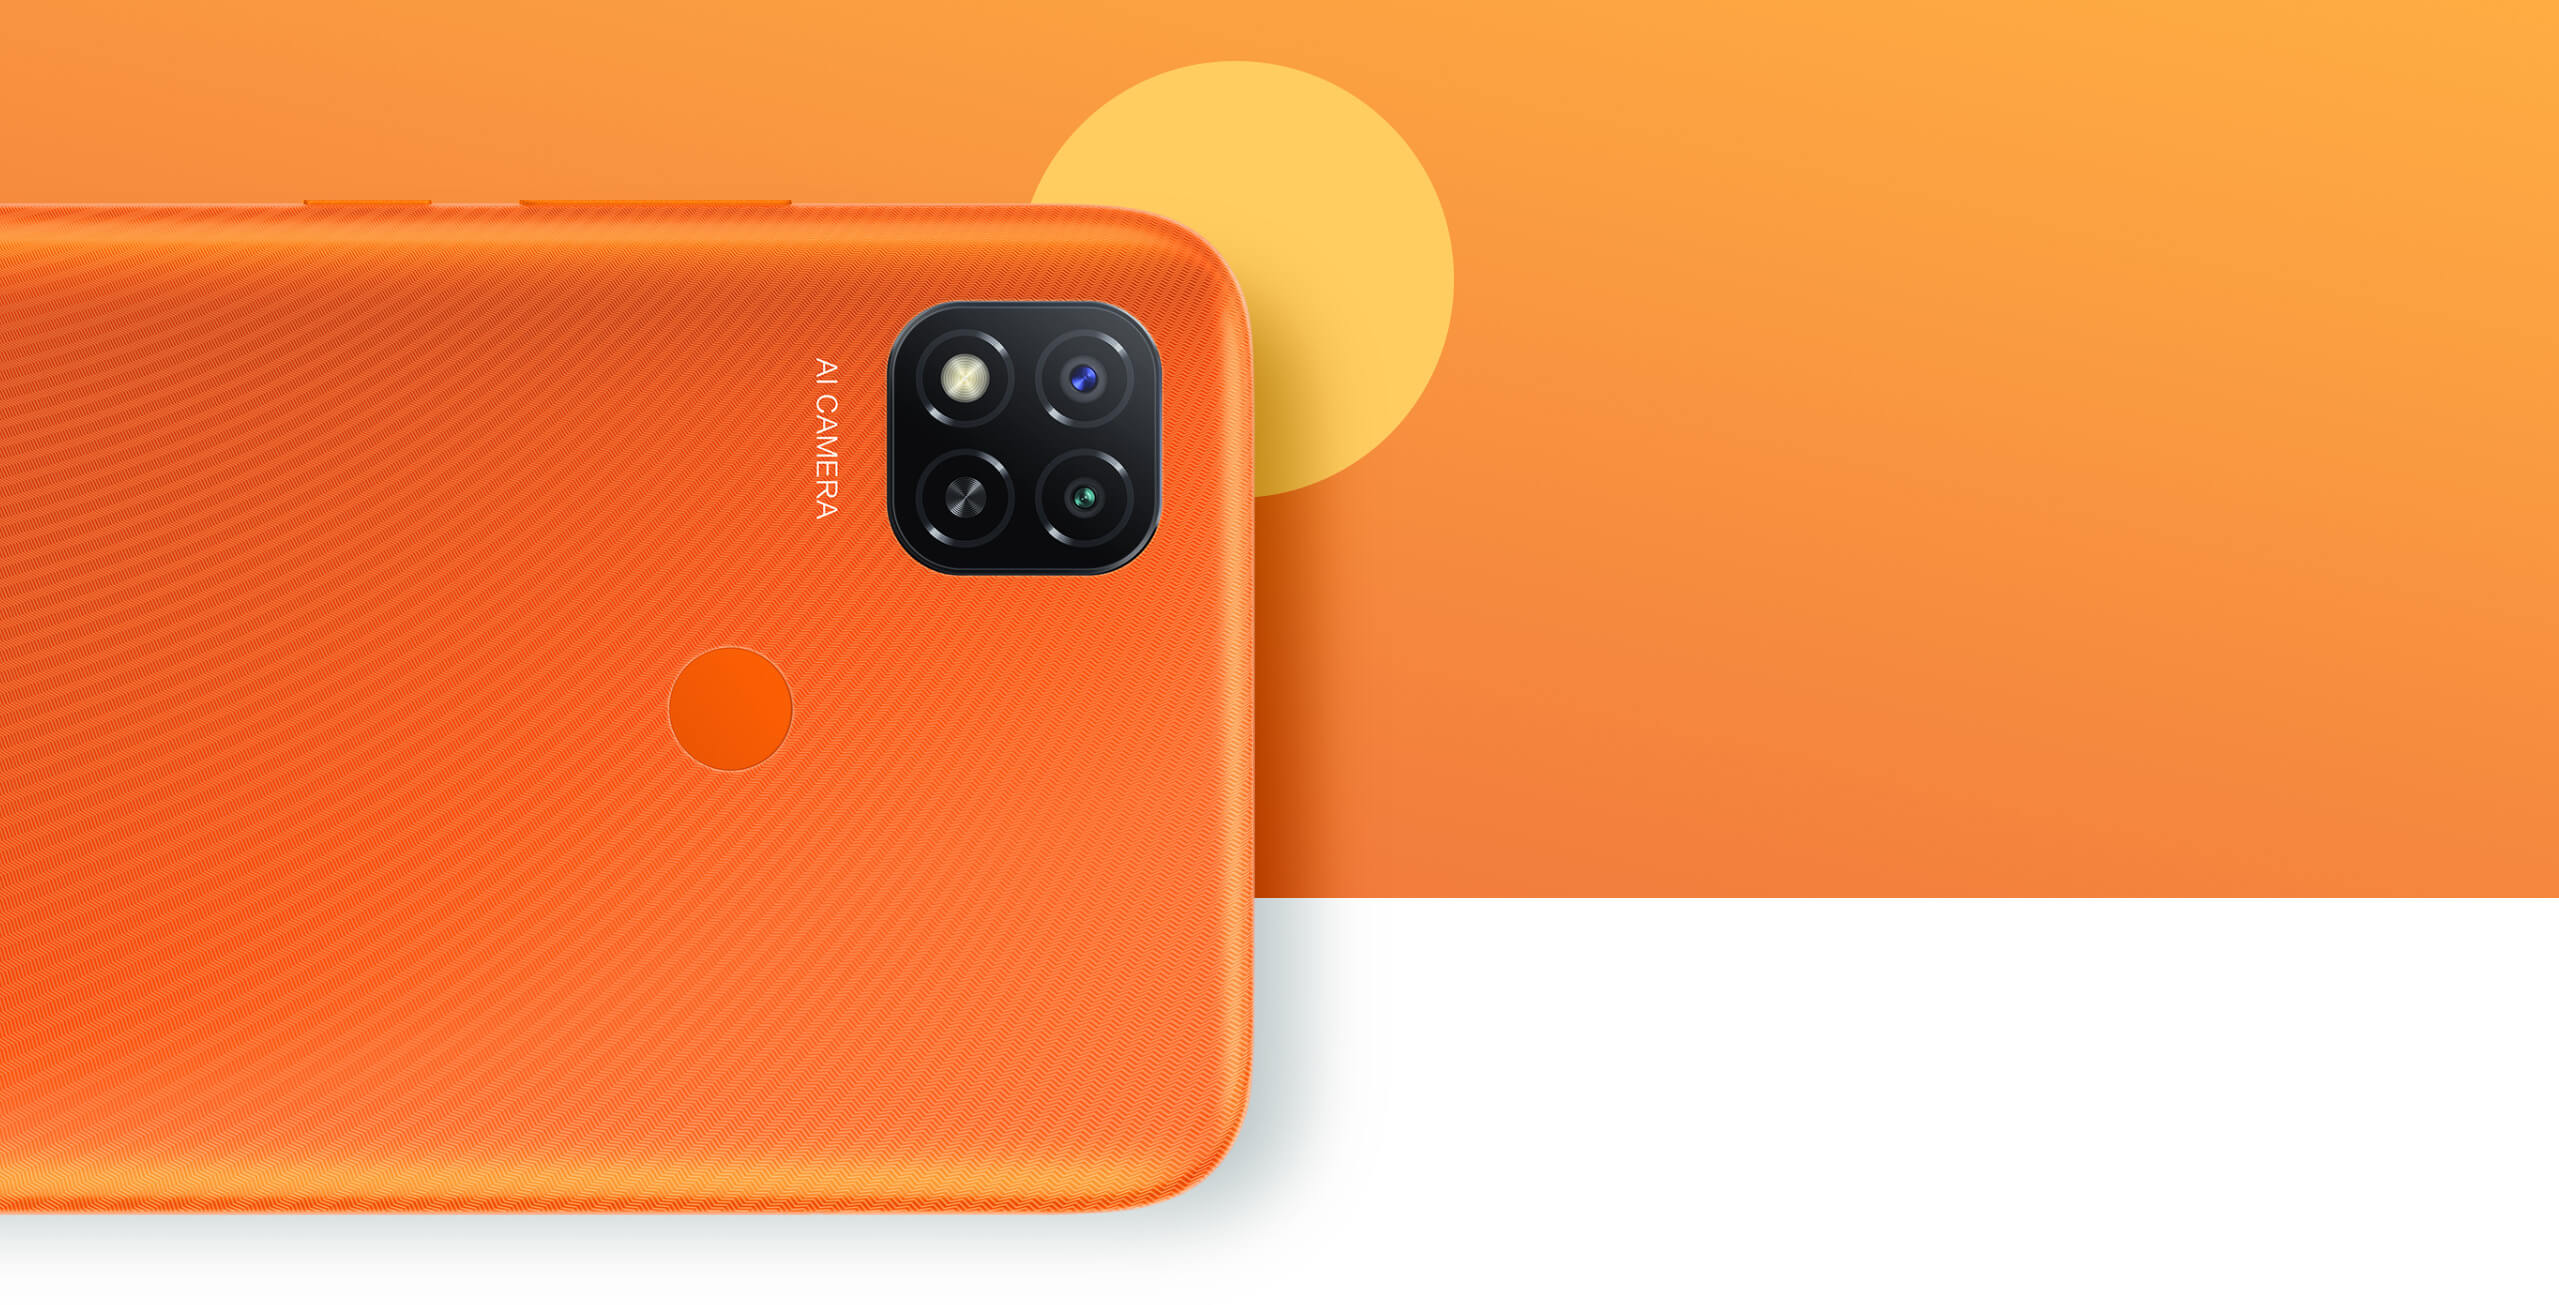 Смартфон Xiaomi Redmi 9C 3/64 NFC 12